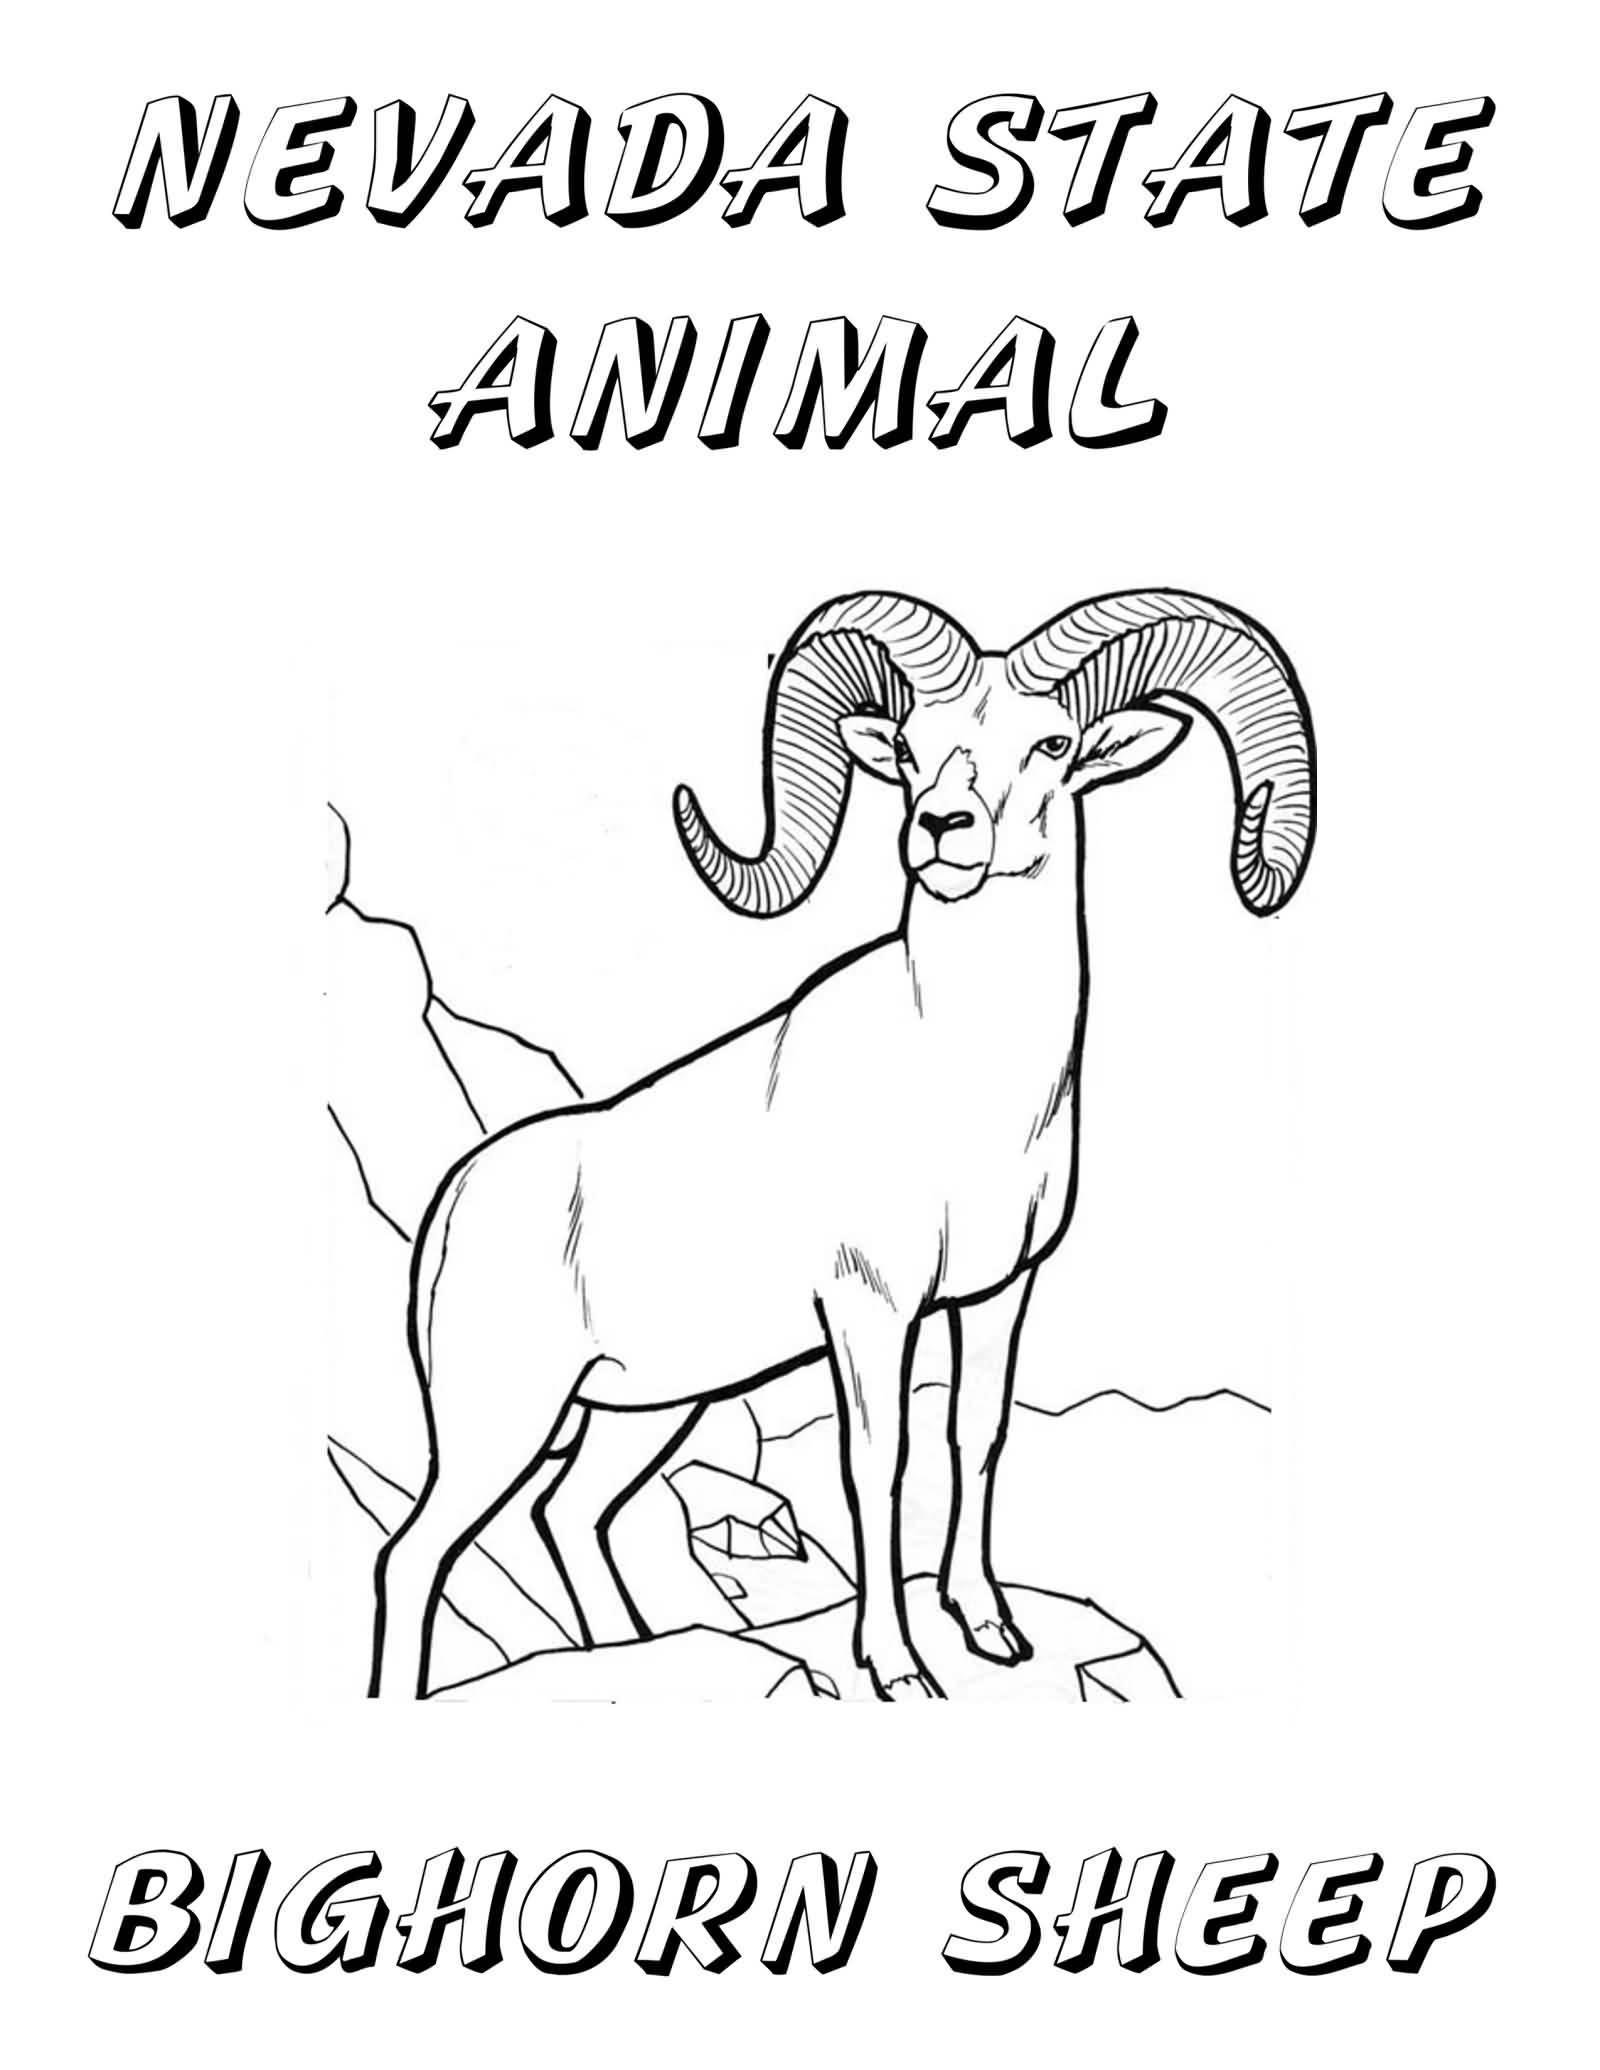 Neveda State Animal Big Horn Sheep Happy Nevada Day